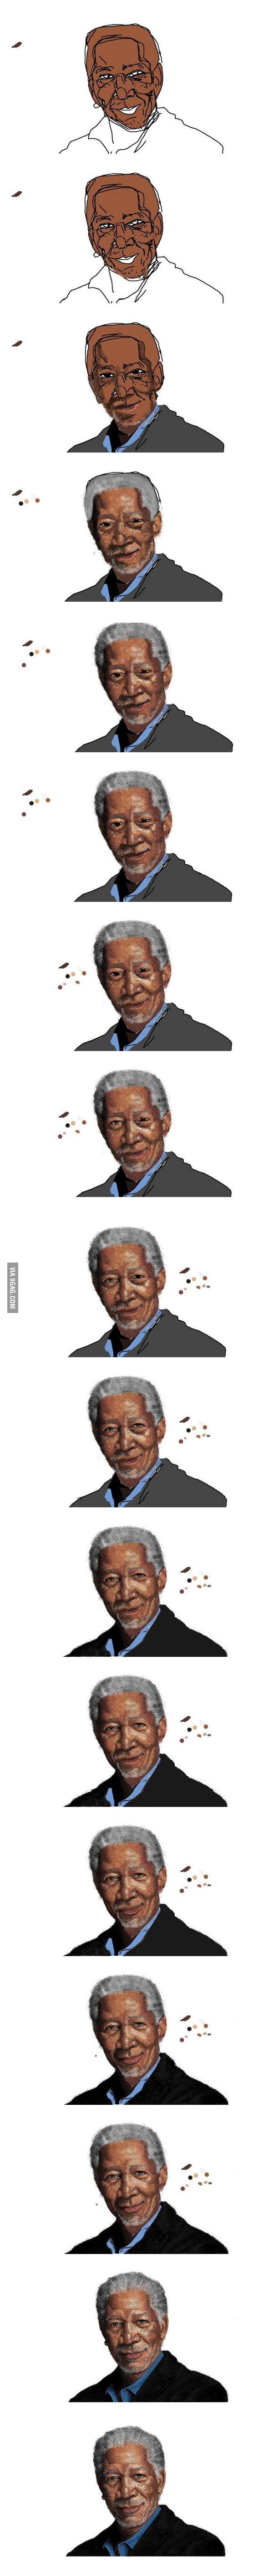 Morgan Freeman In MS Paint